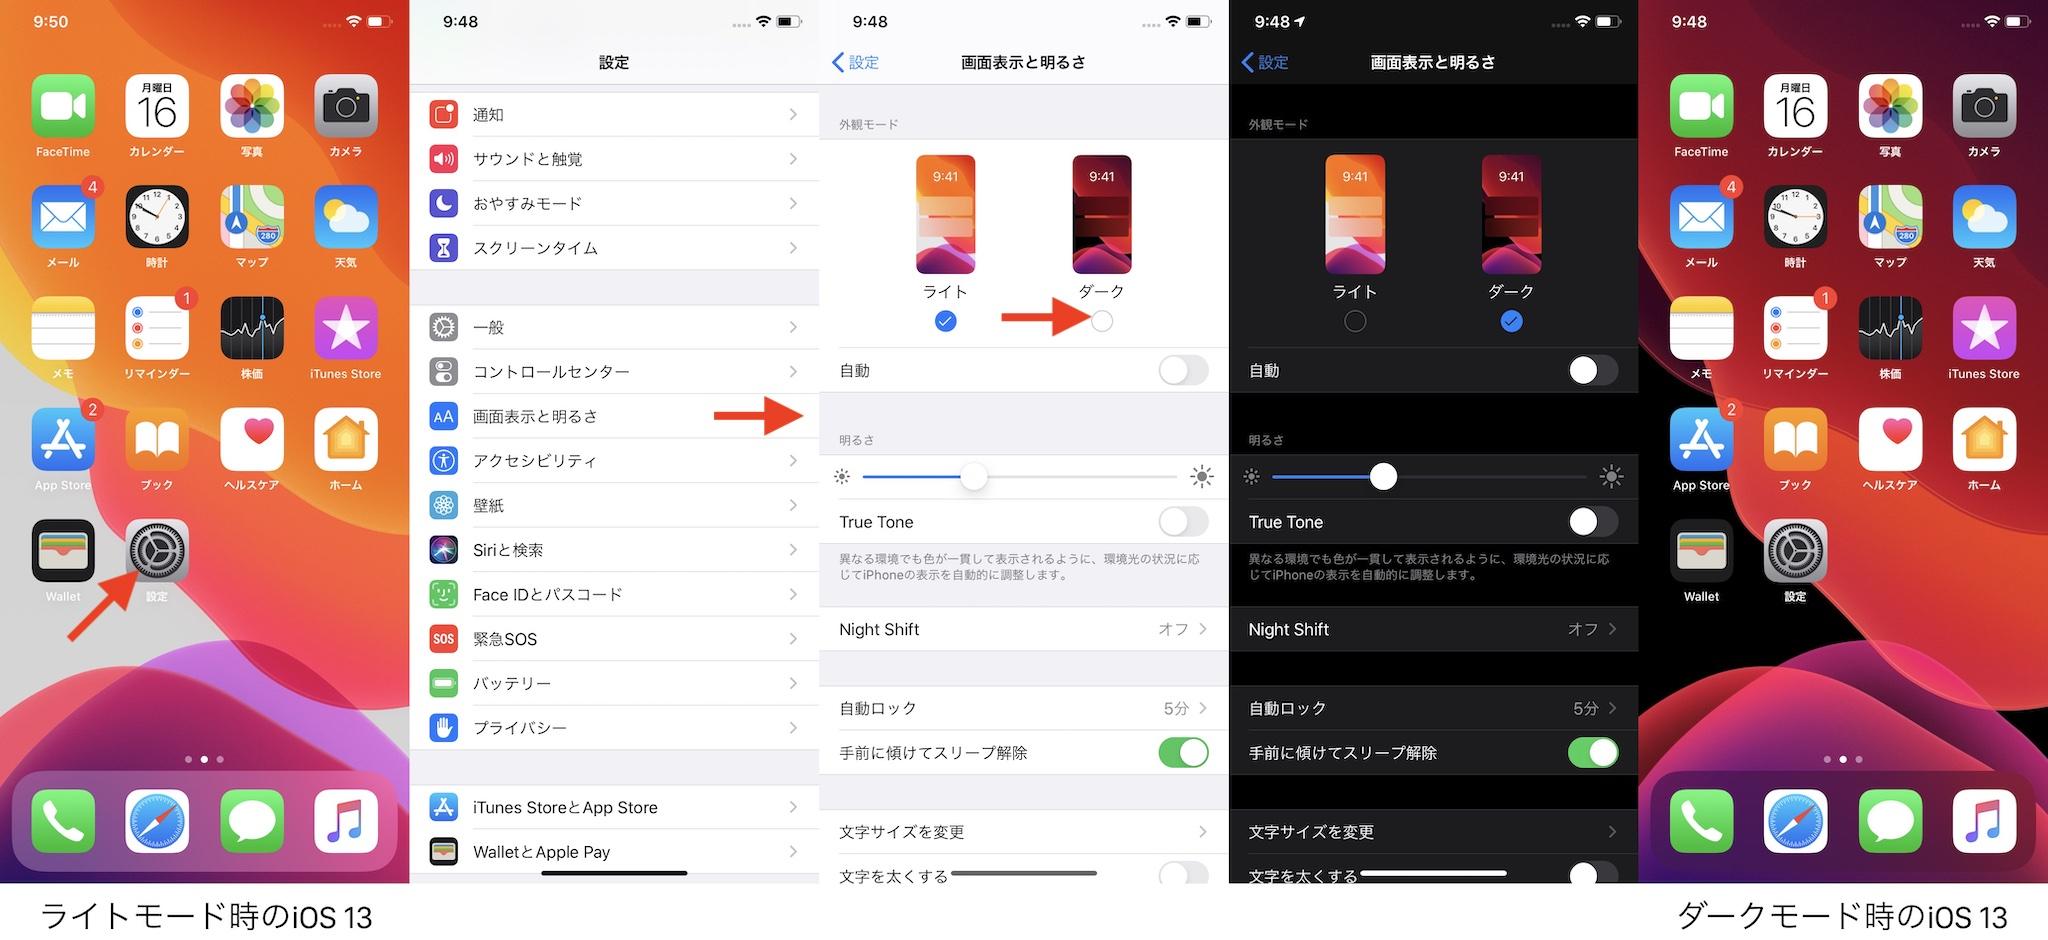 iOS 13でダークモードを有効にする方法